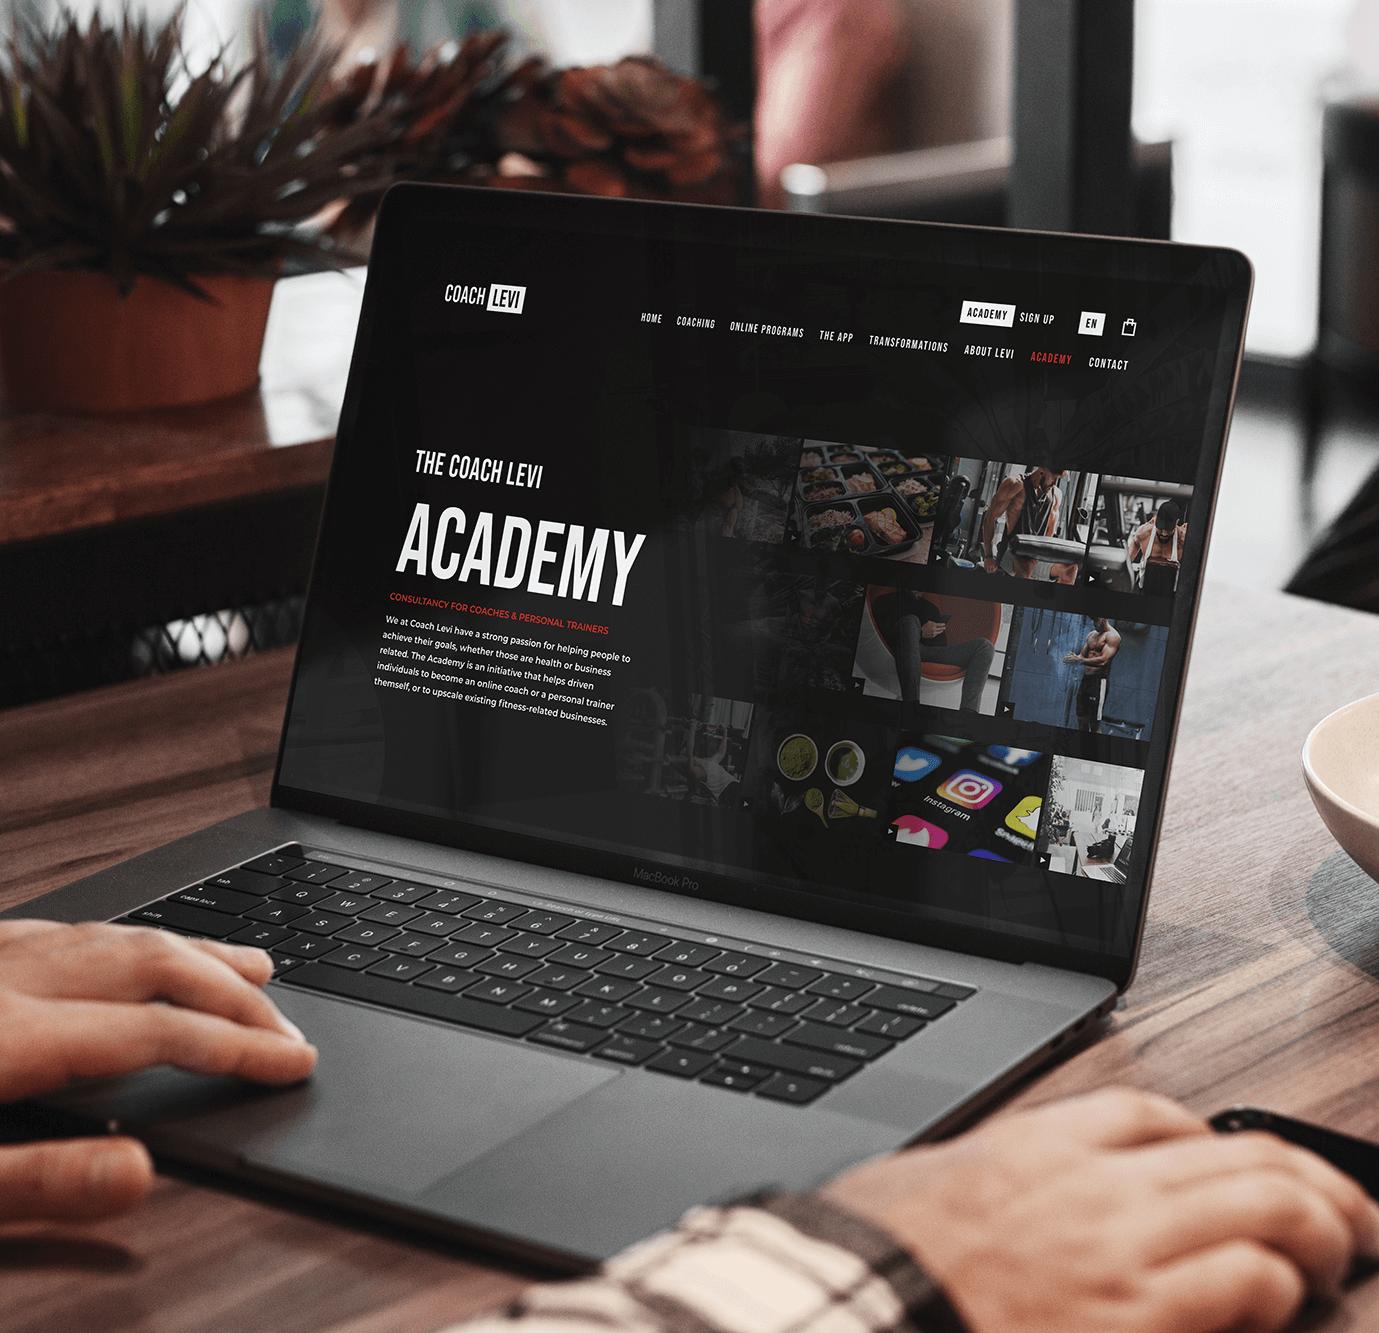 Project Coach Levi | lsDevign - Web Development en Webdesign op maat regio Lichtervelde